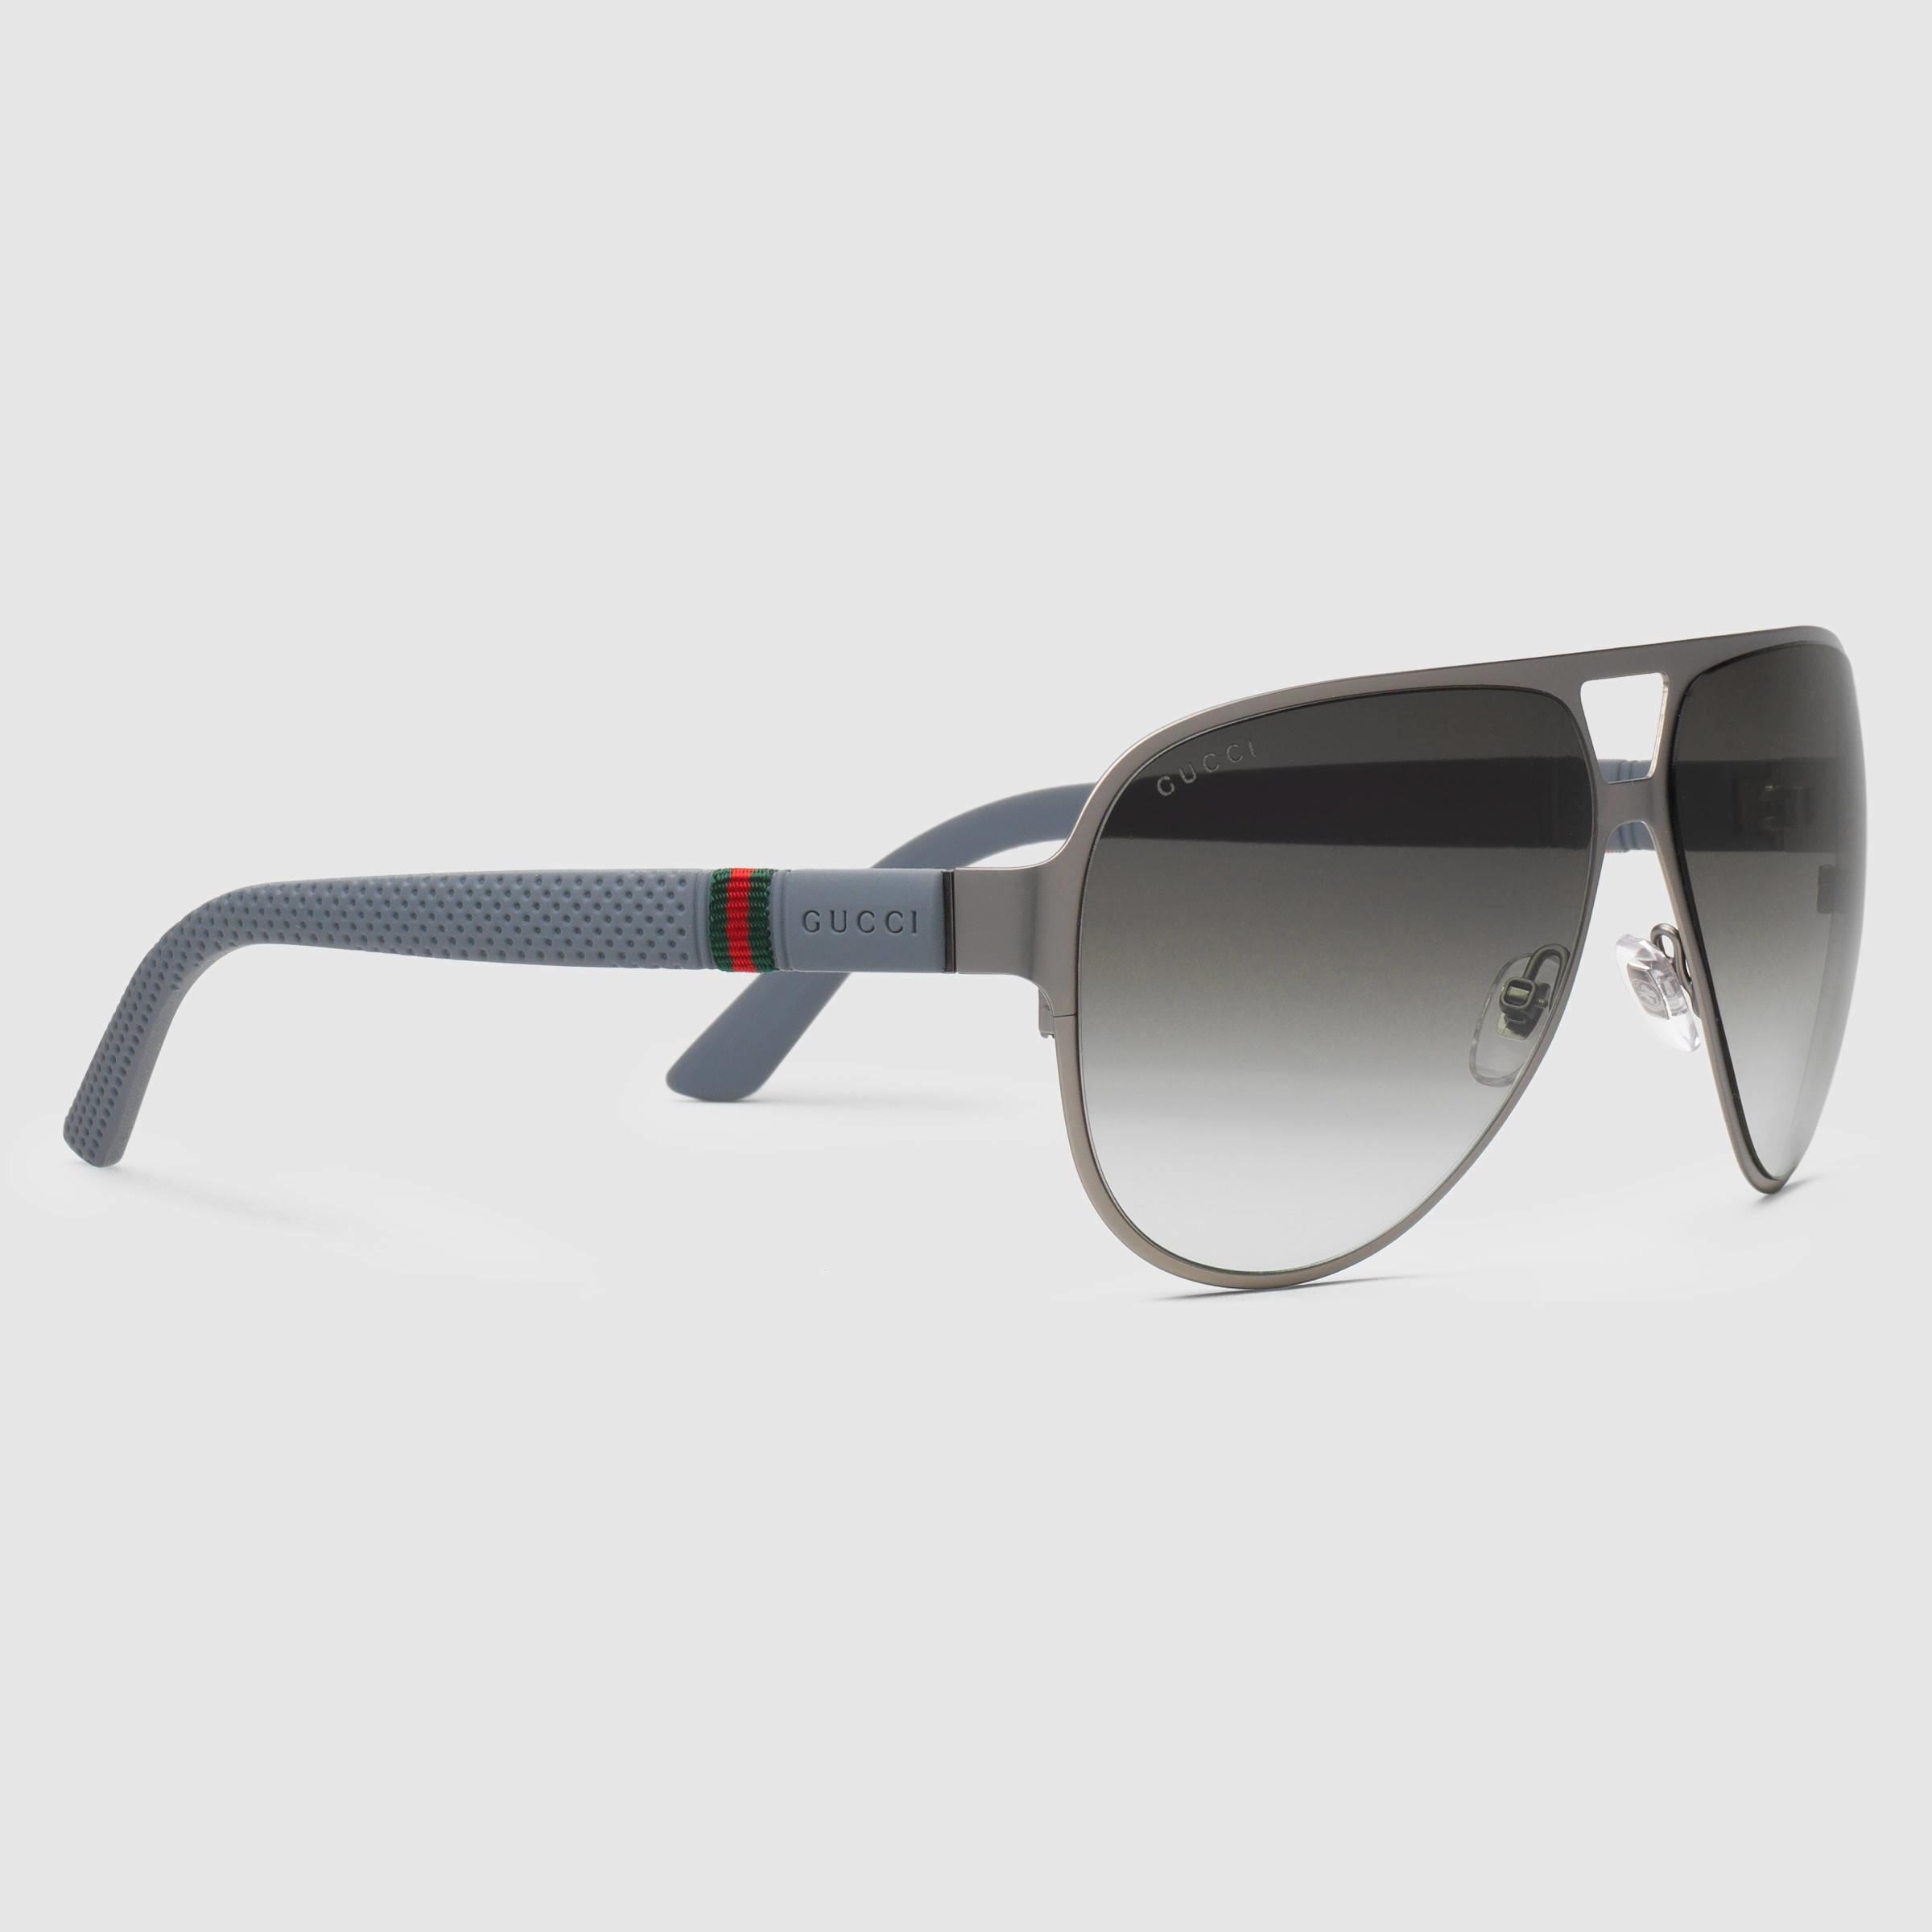 2179fdaa656 Lyst - Gucci Light Steel Aviator Sunglasses in Gray for Men